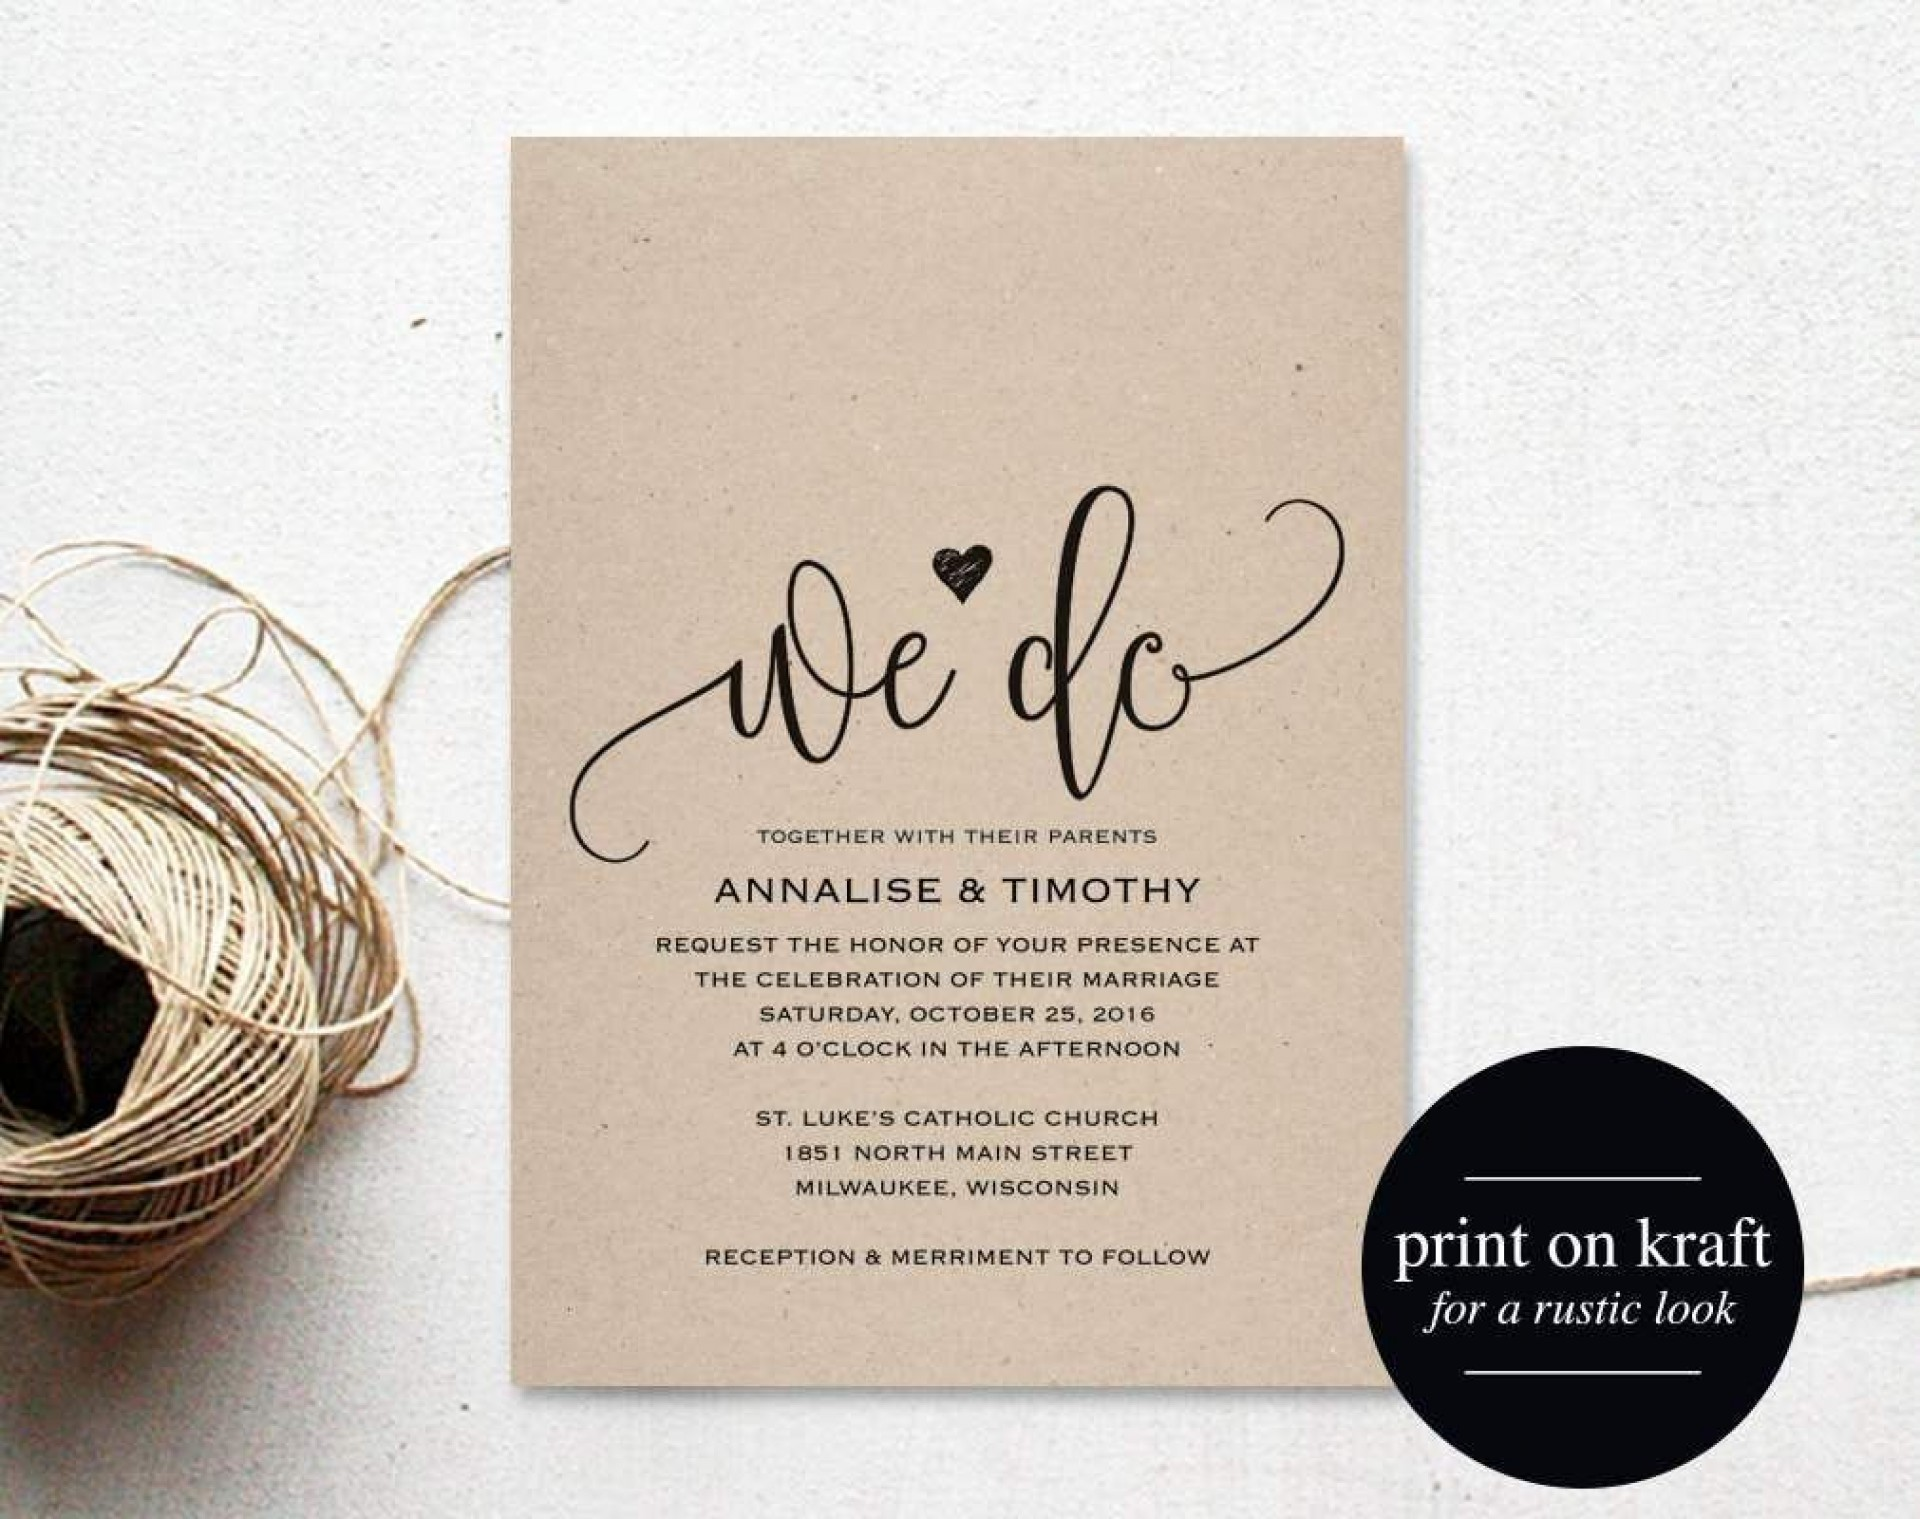 001 Simple Free Wedding Template For Word Inspiration  Invitation In Marathi Menu1920